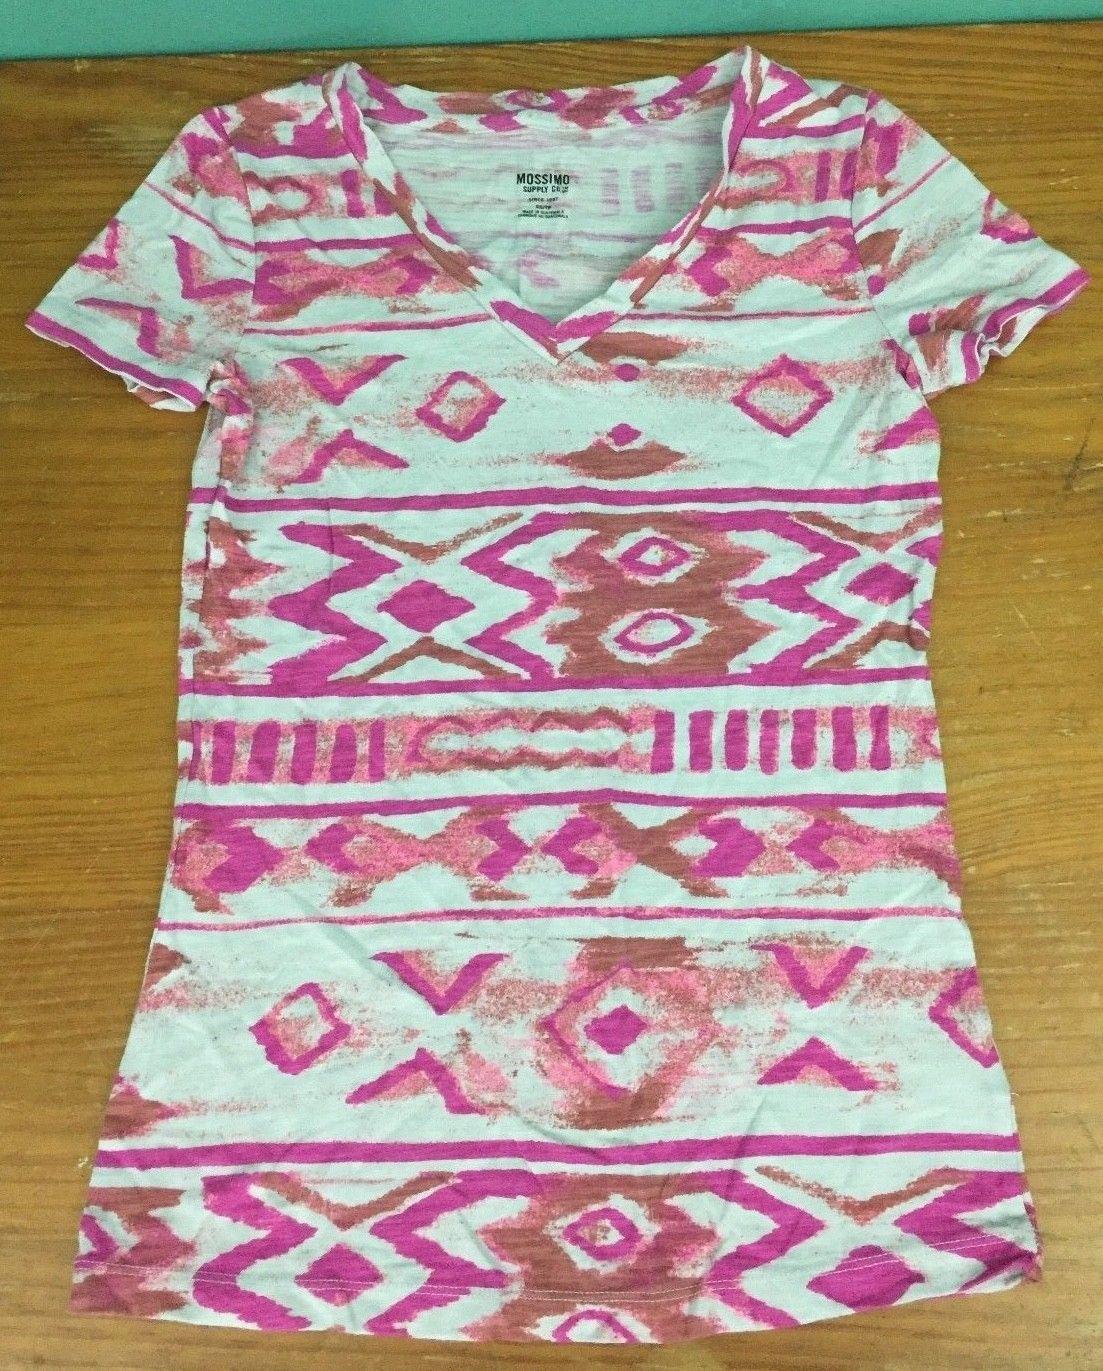 82e9622fd S l1600. S l1600. Previous. Mossimo Women's Southwestern Pattern V-Neck T- Shirt - Size XS - Pink &